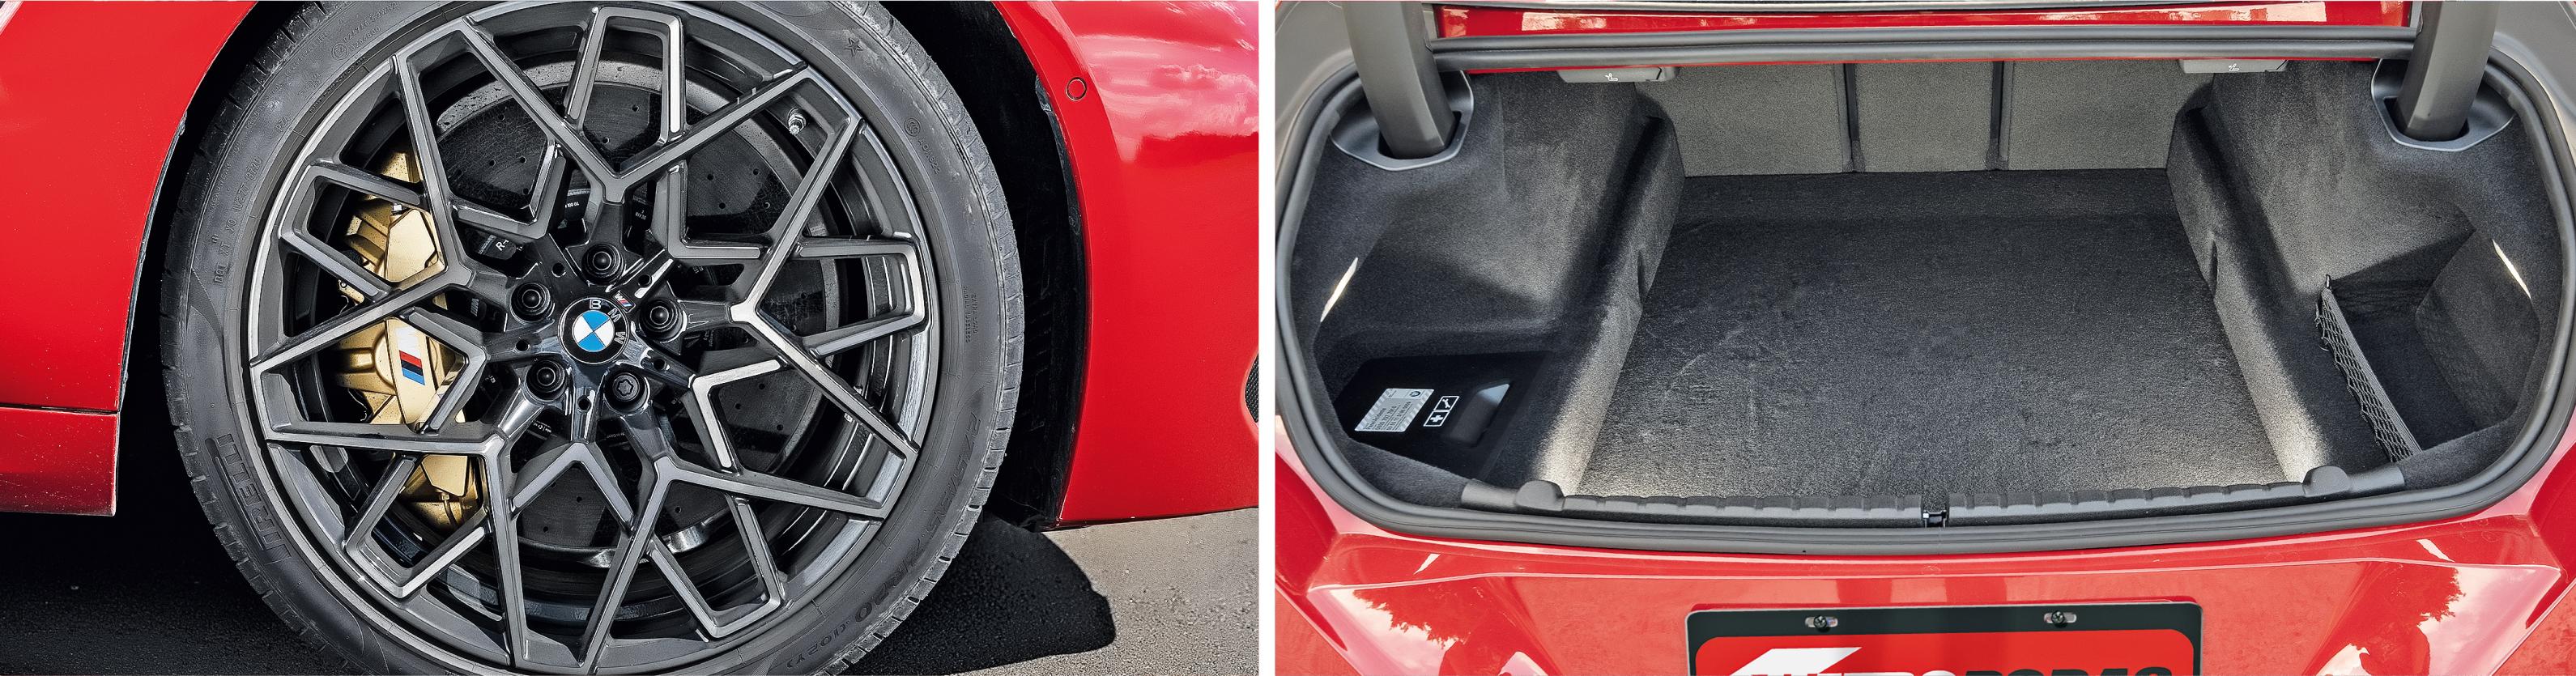 Audi RS7 x M8